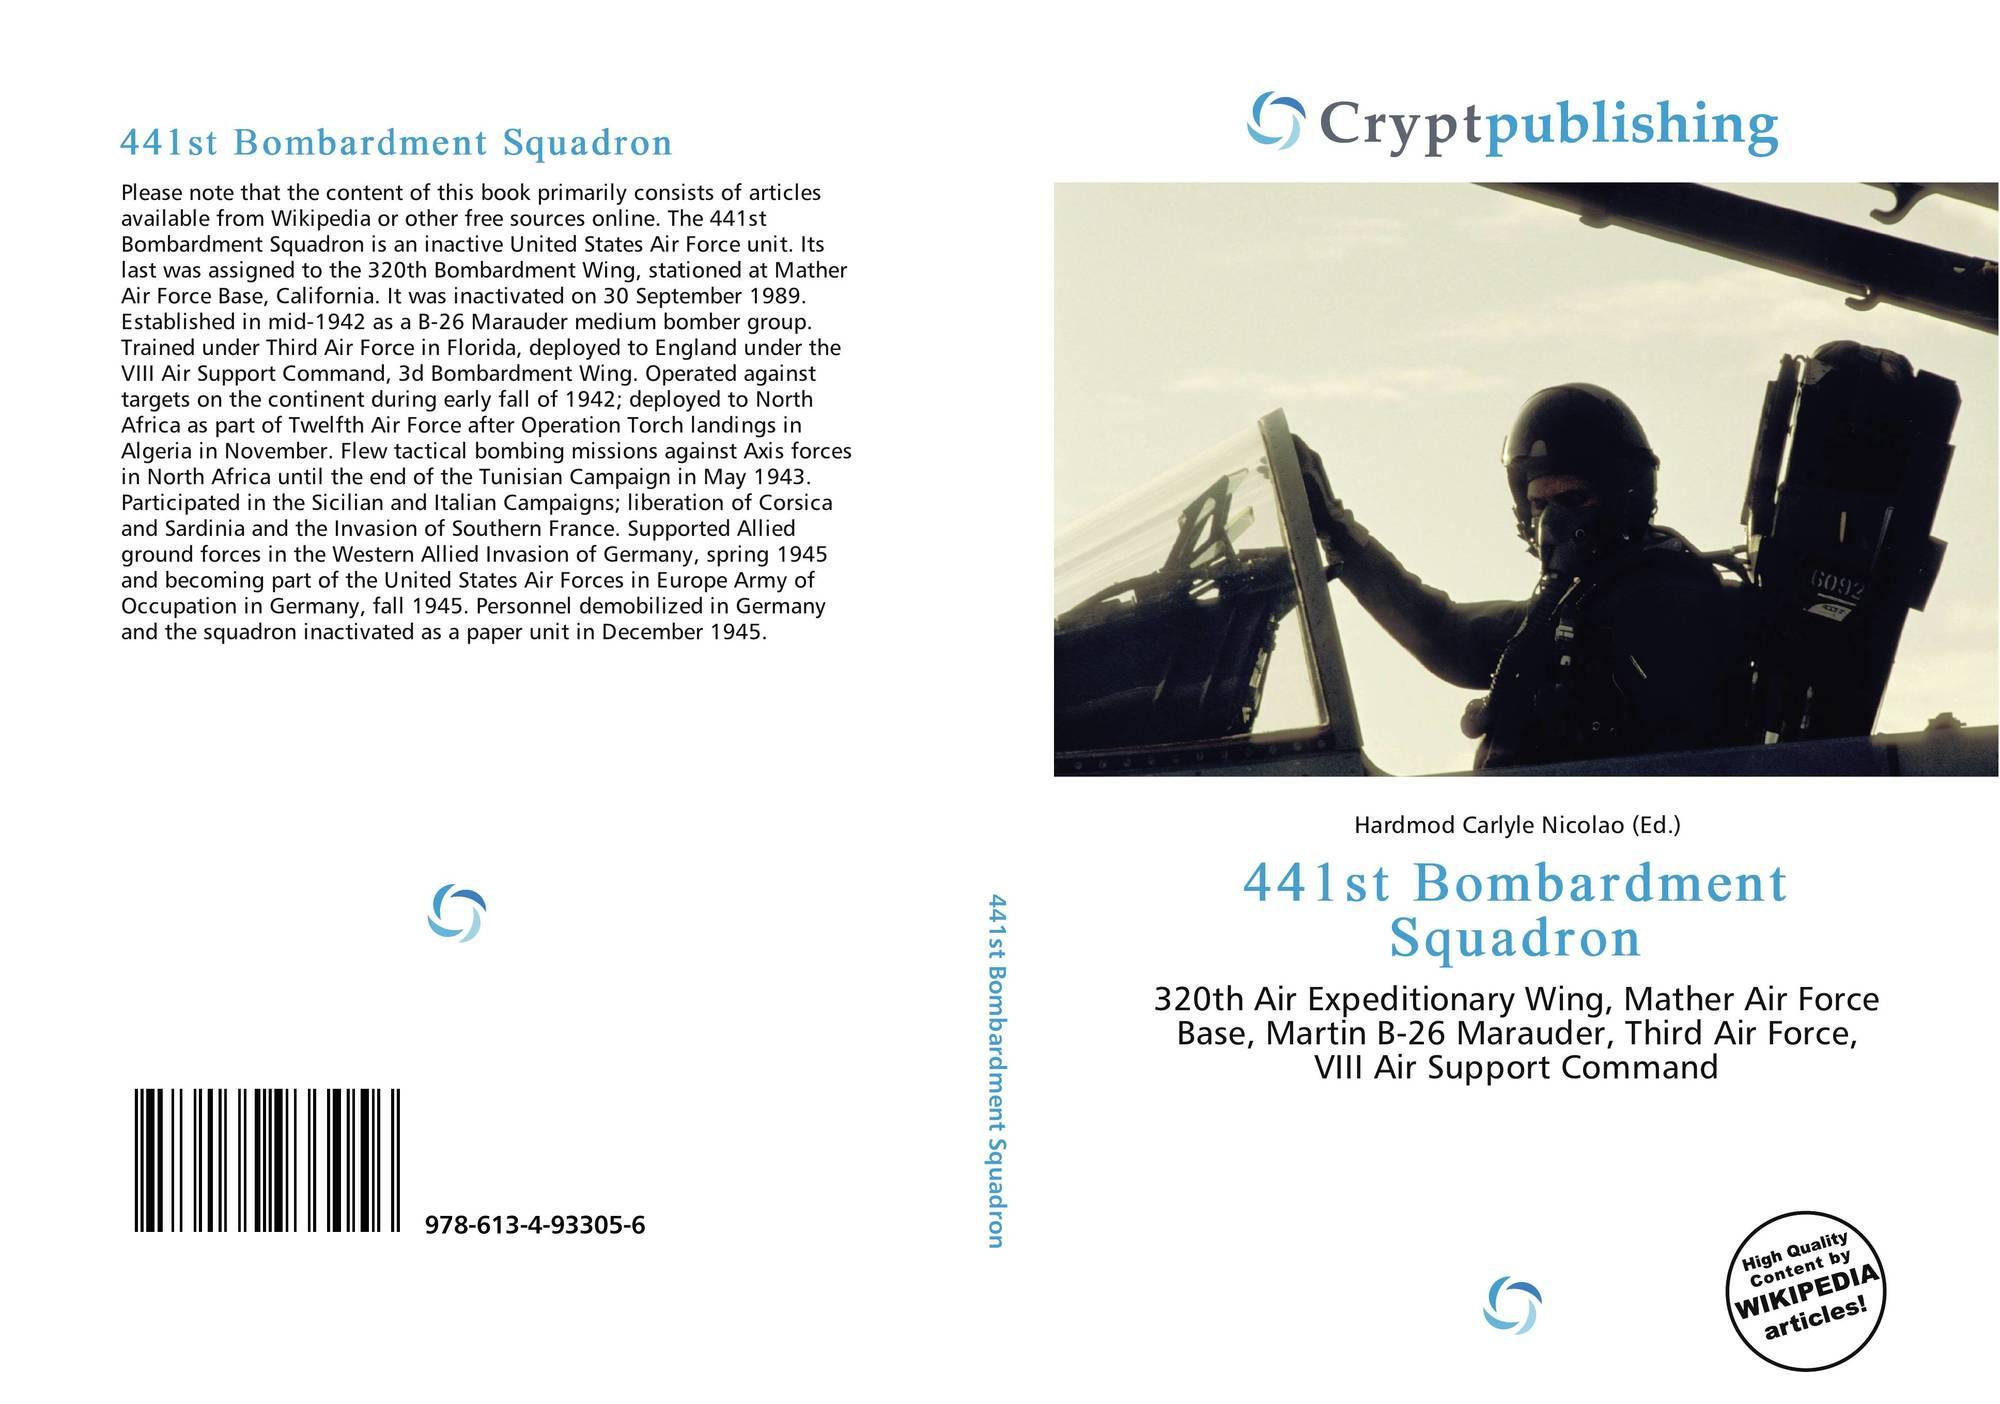 Search Results For Dive Bomber B 26 Marauder Engine Diagram Bookcover Of 441st Bombardment Squadron Omni Badge 9307e2201e5f762643a64561af3456be64a87707602f96b92ef18a9bbcada116